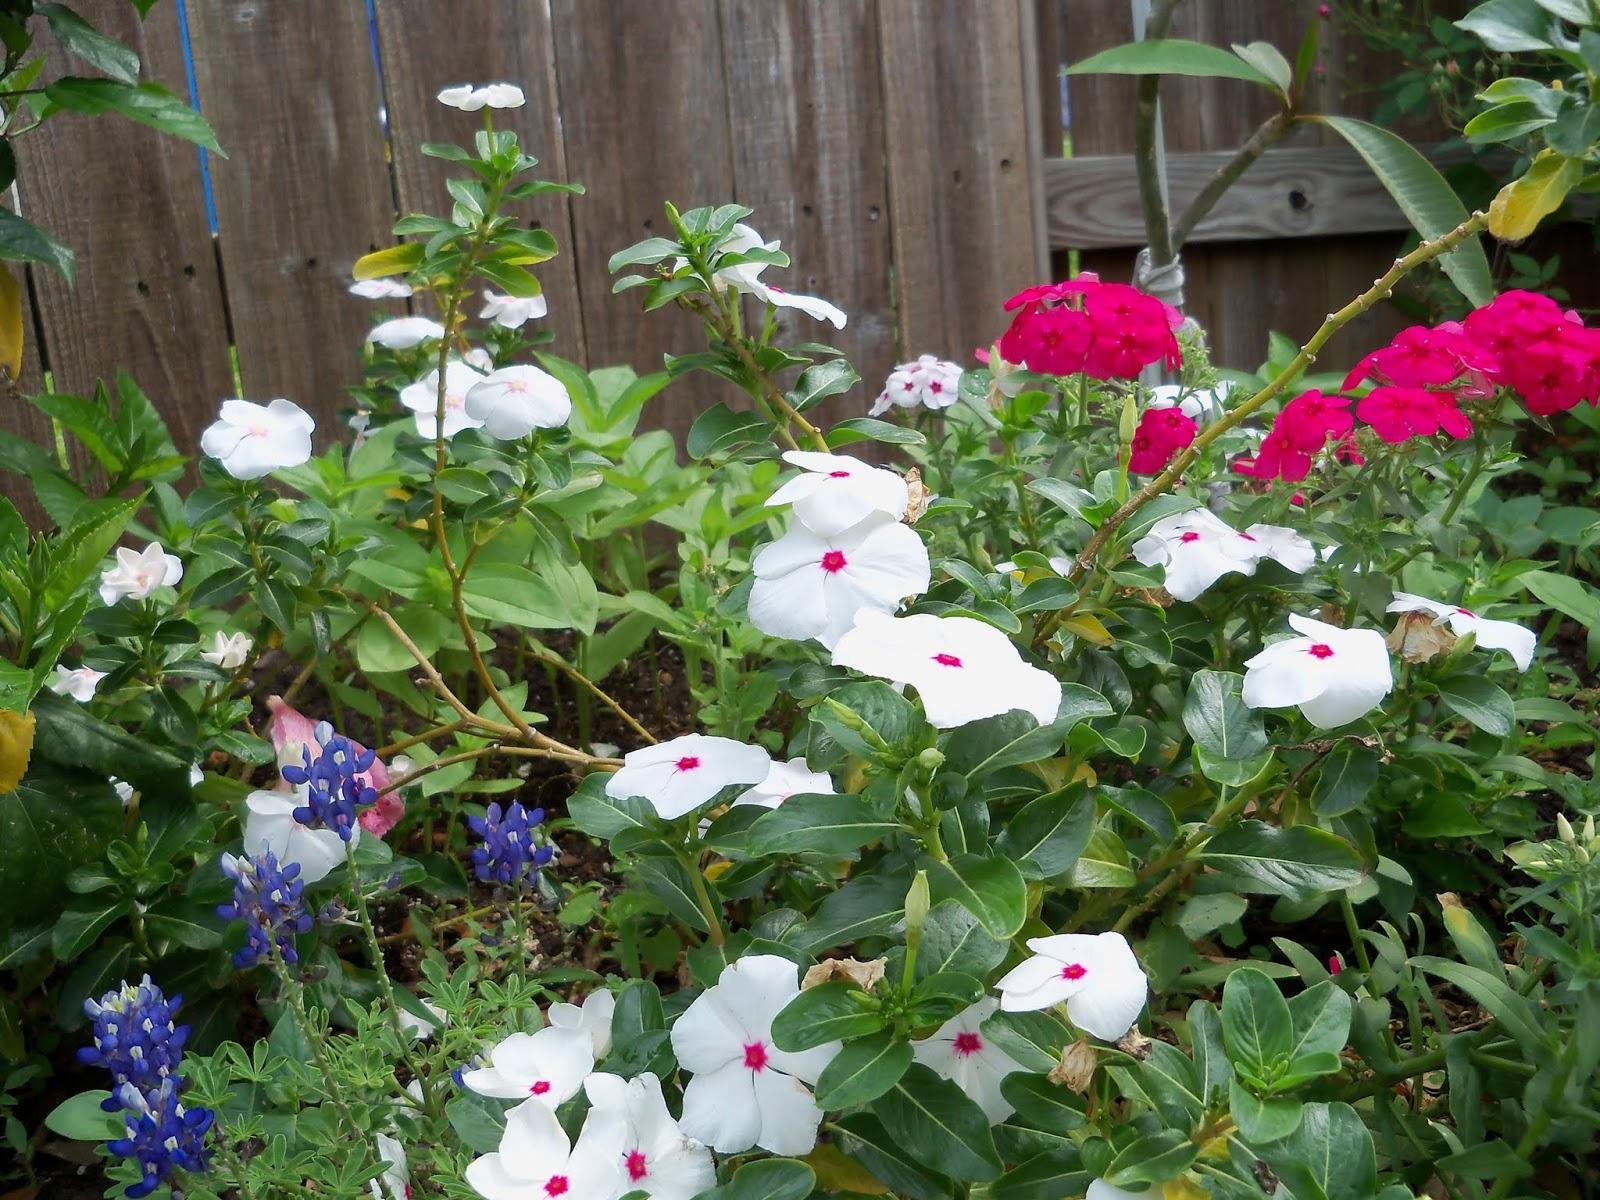 Gardening 2013 - 115_6010.JPG